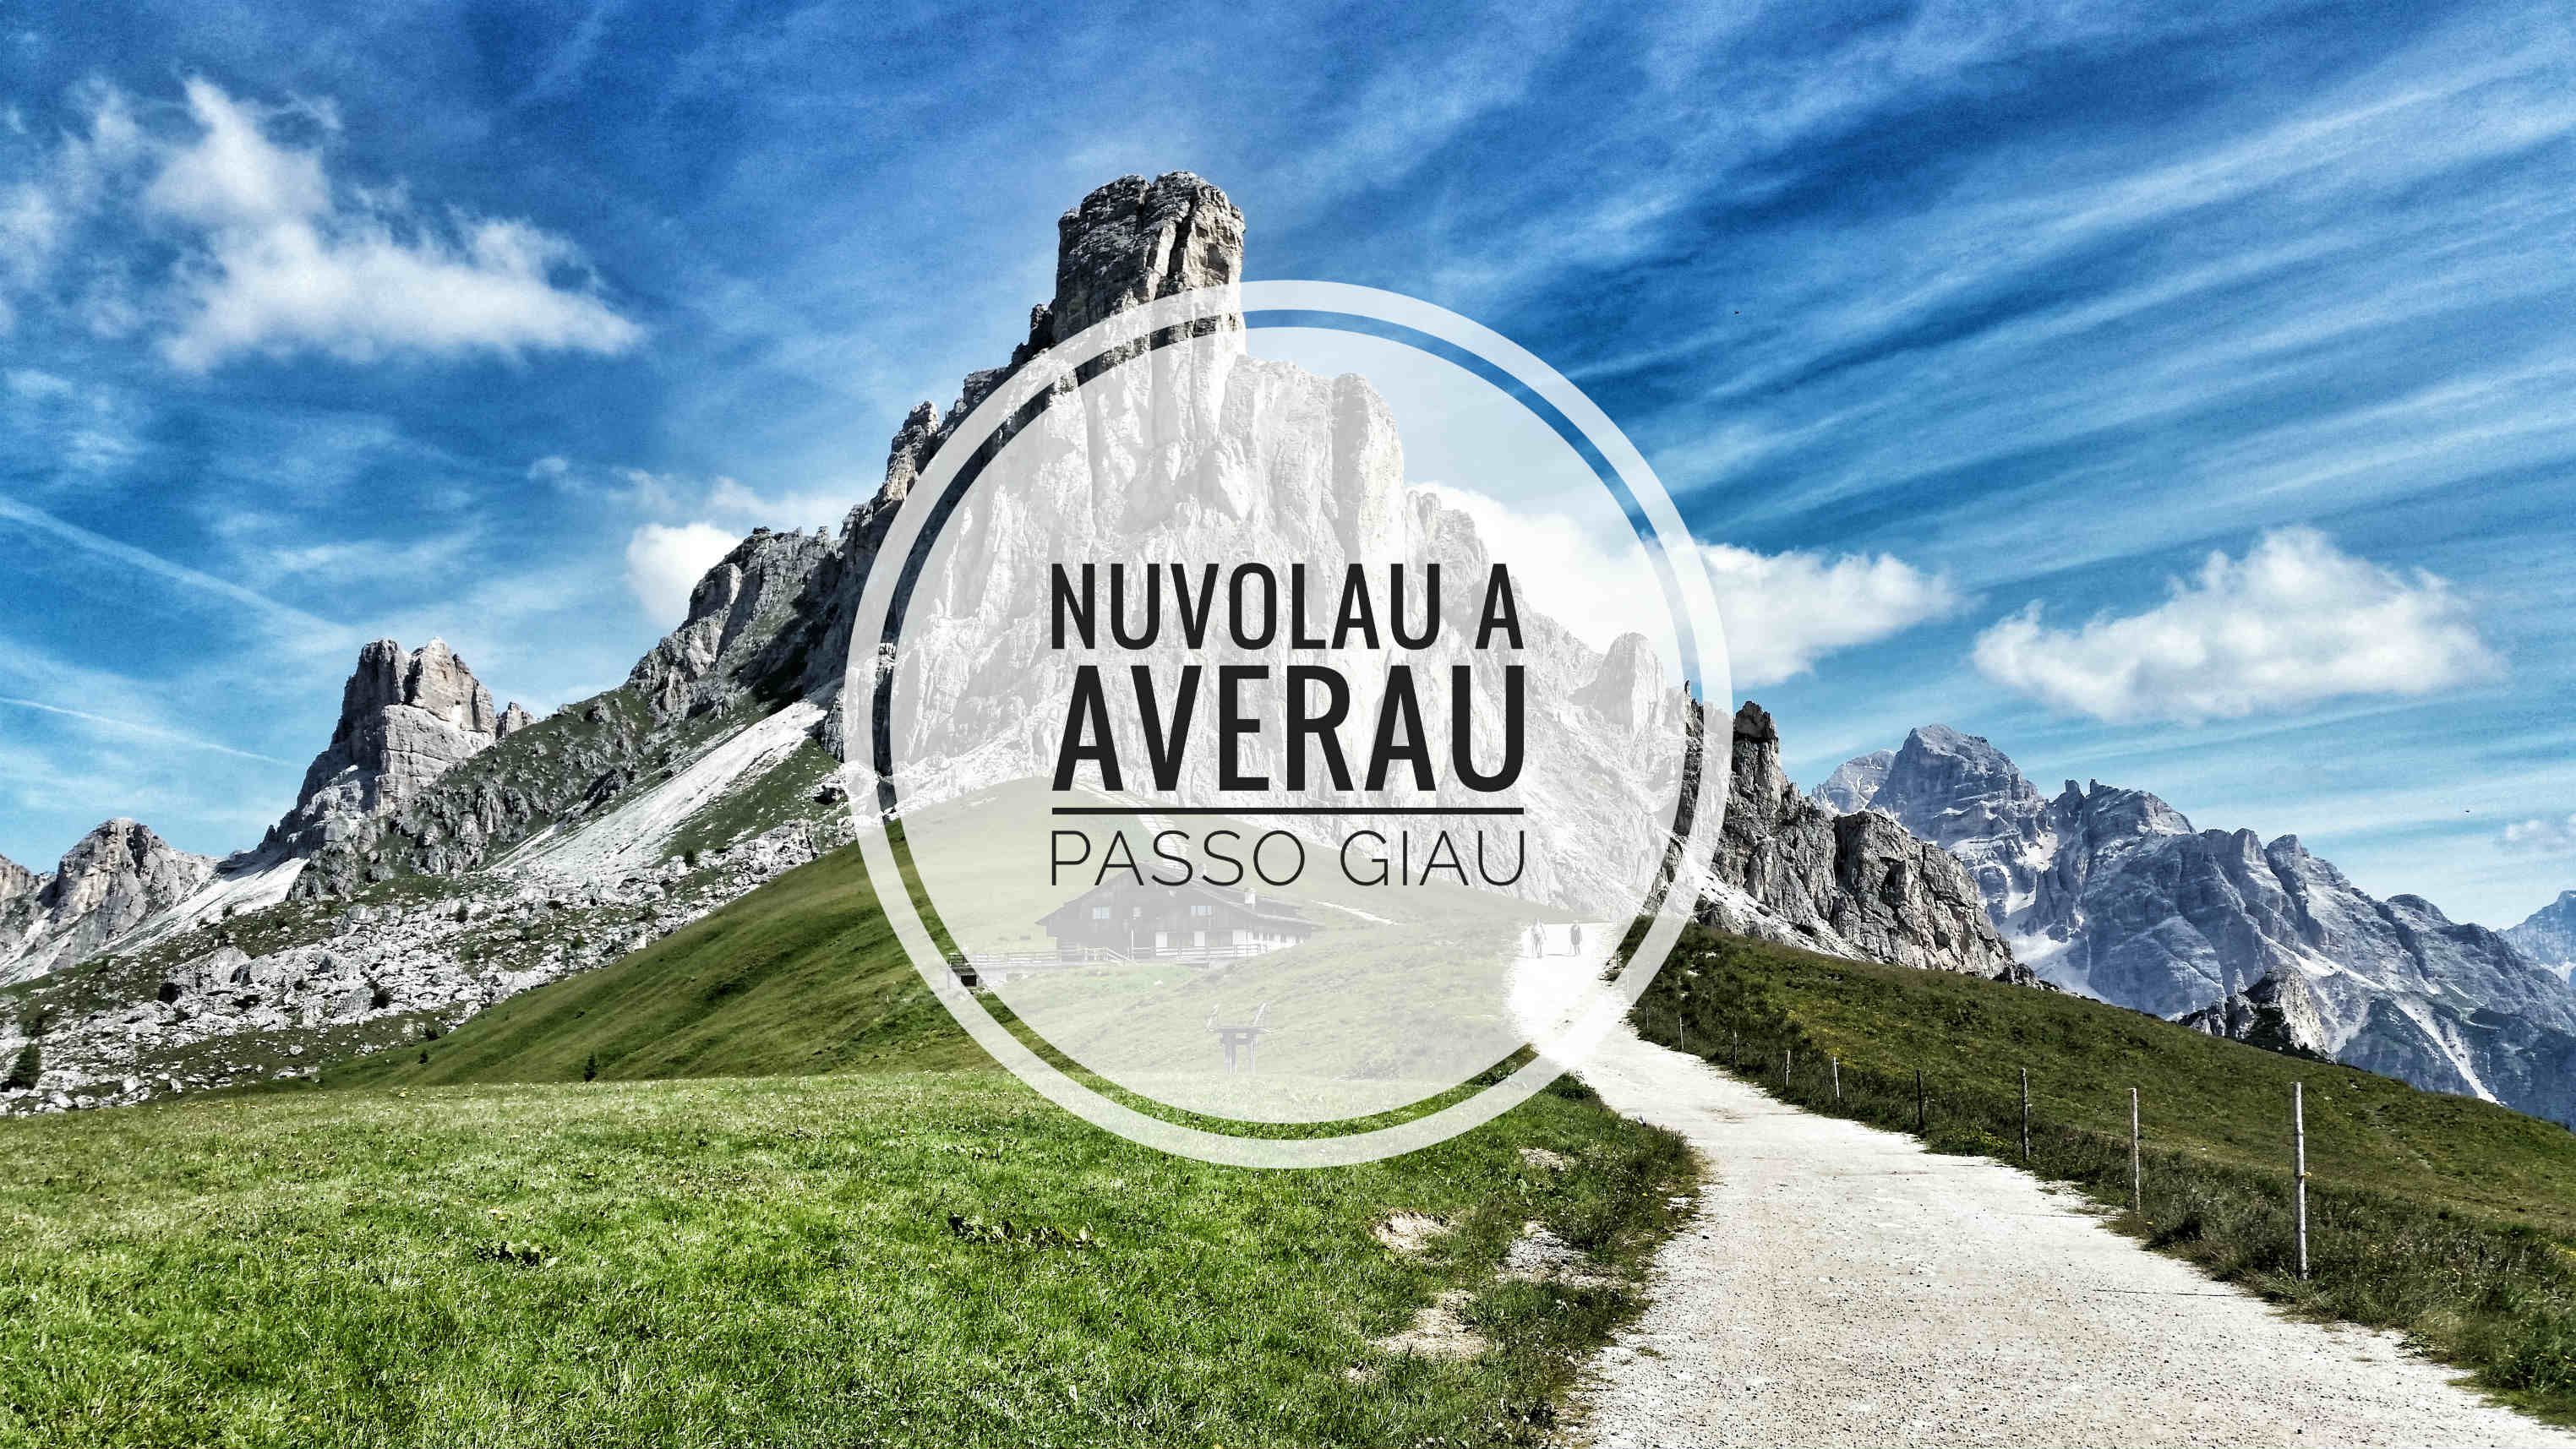 Nuvolau a Averau – Passo Giau